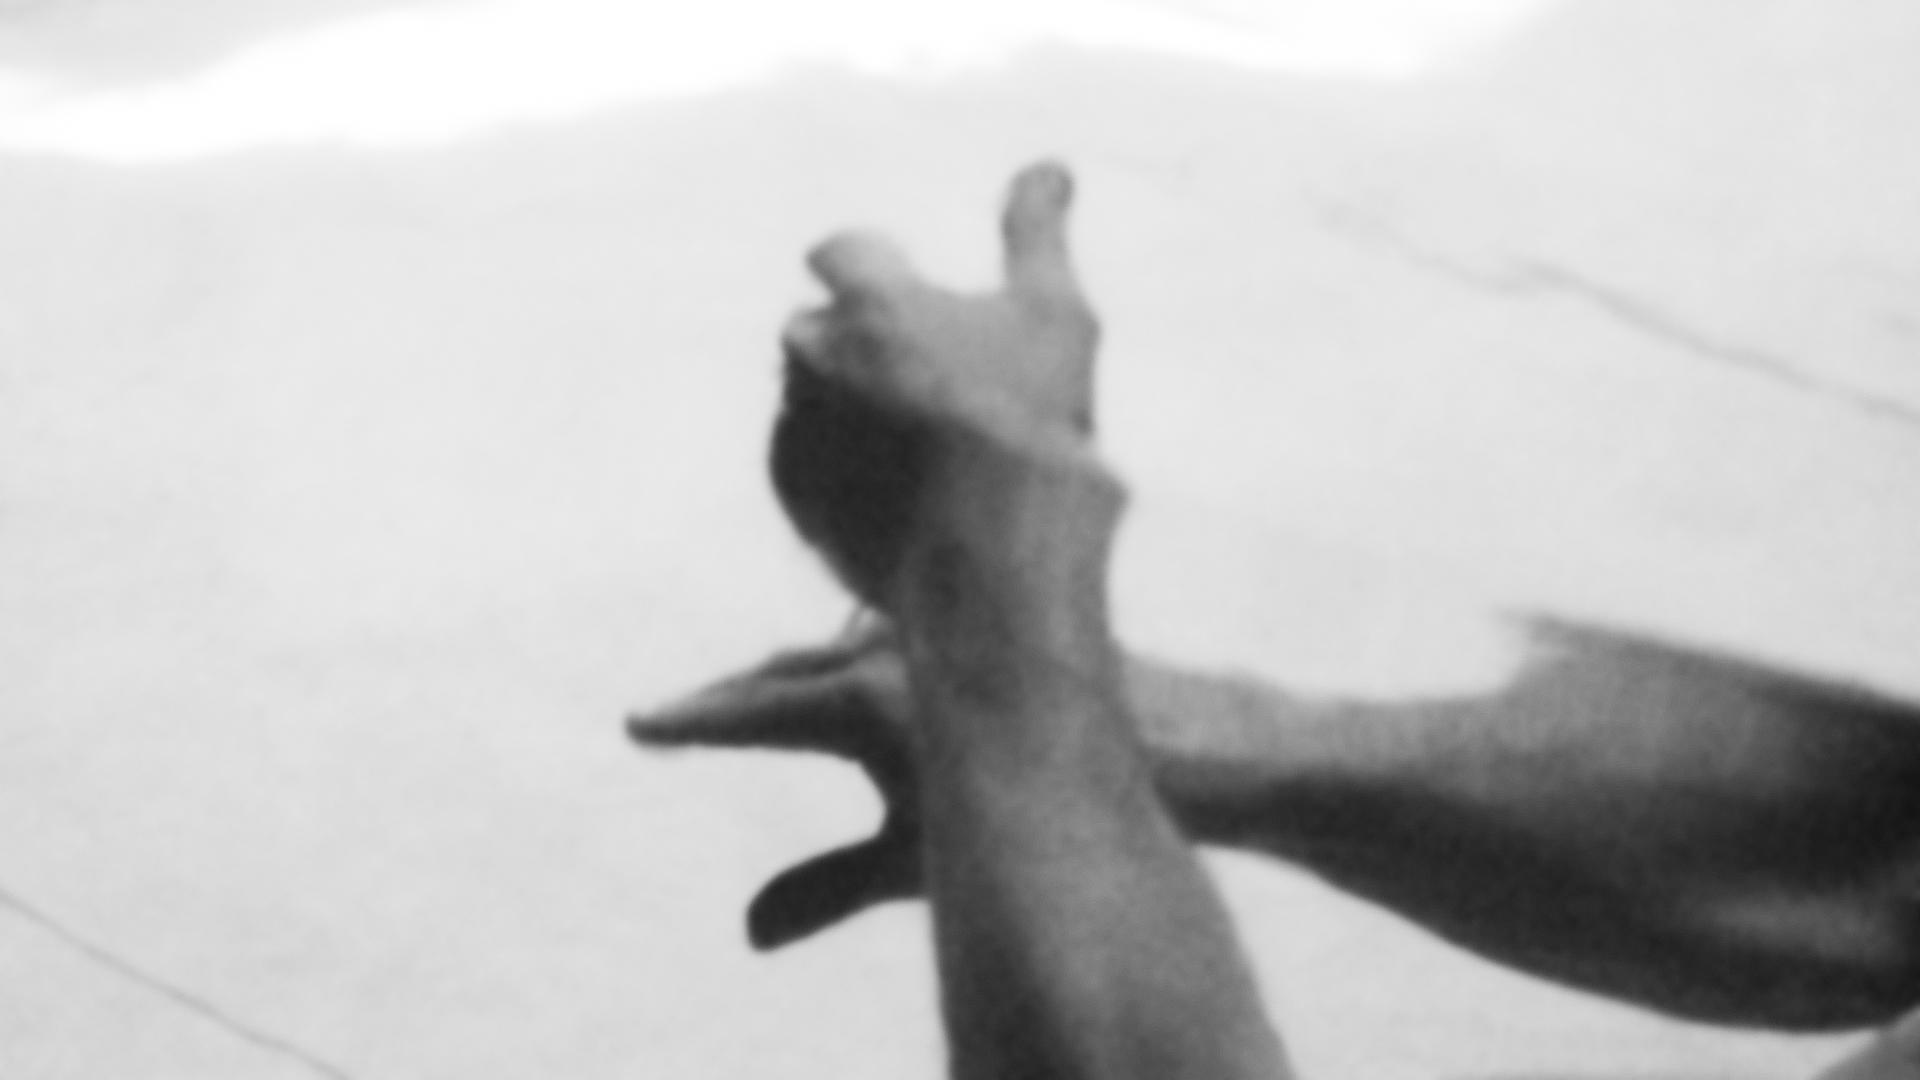 073_rsiegal_hands_mirror-2